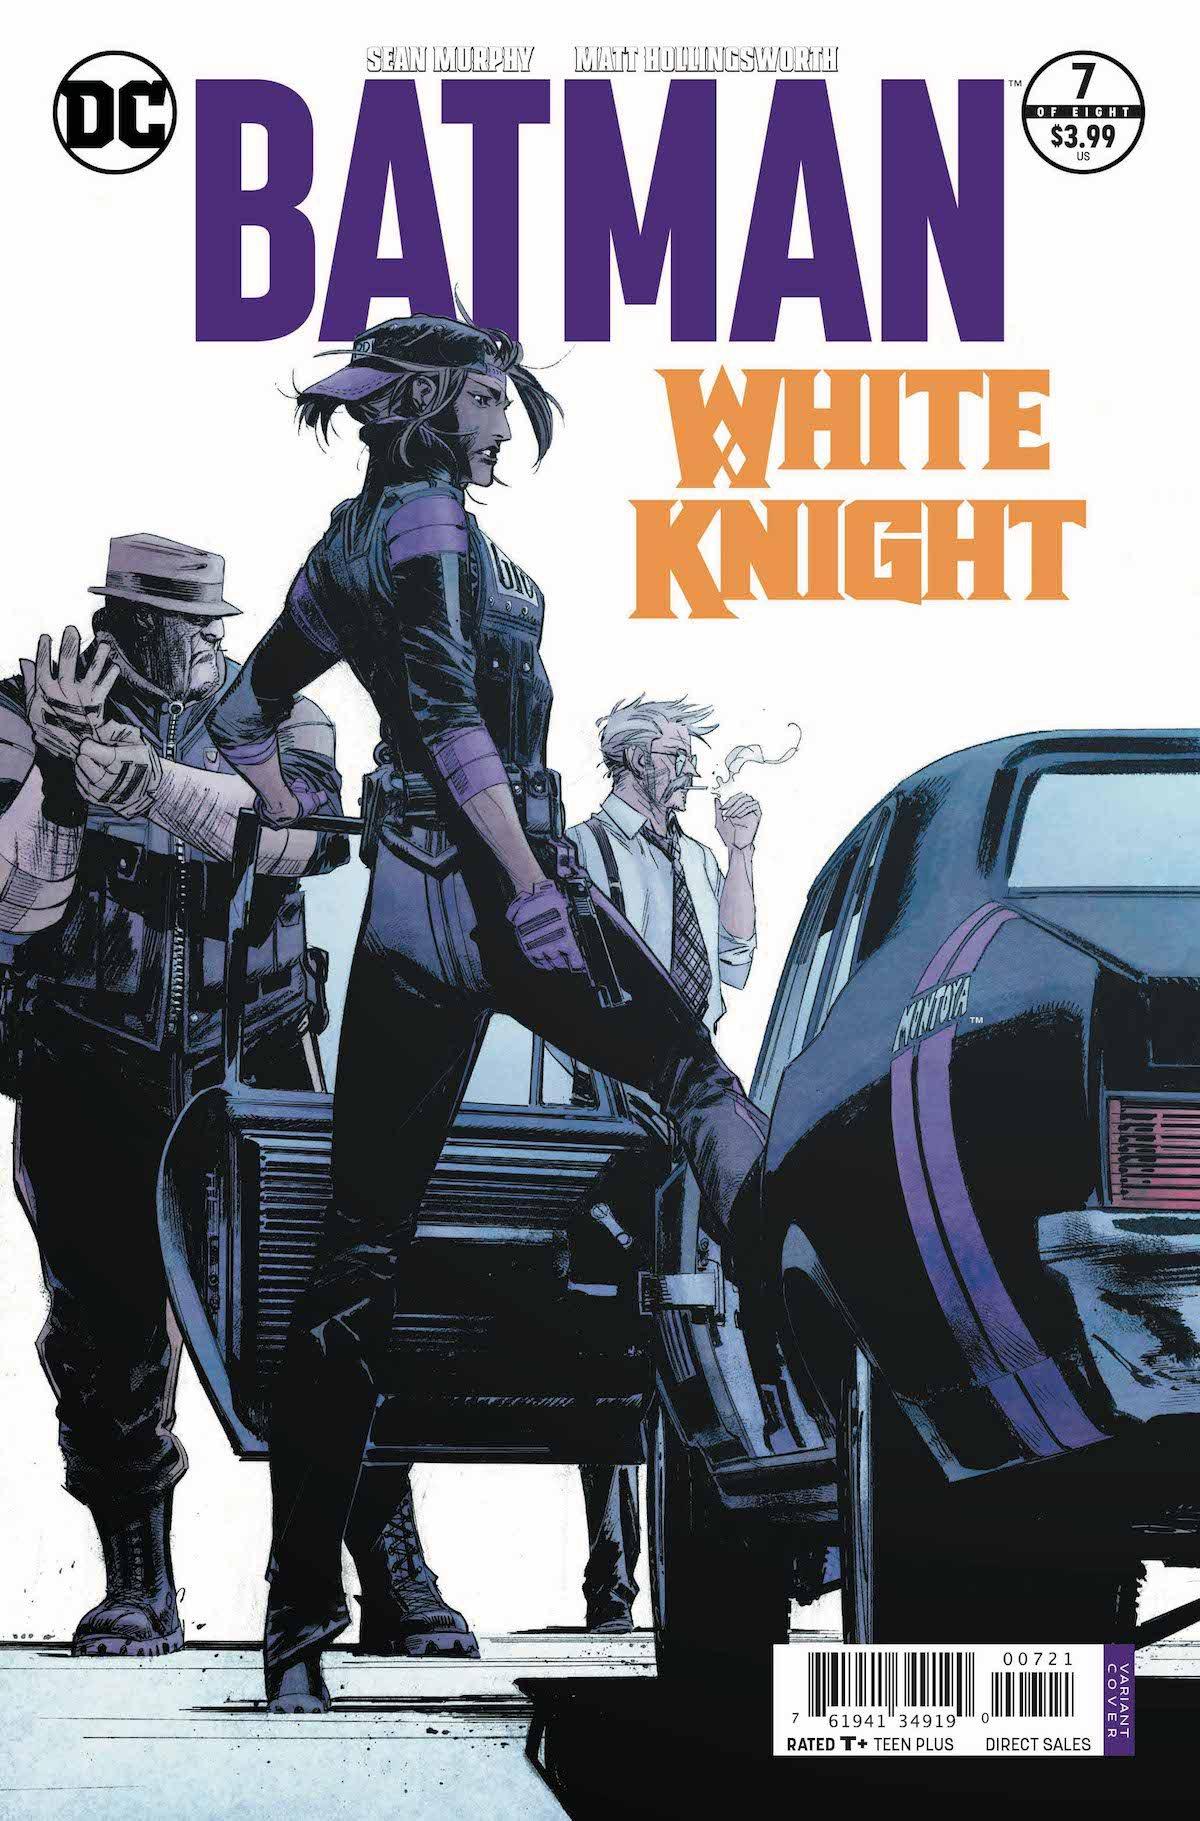 Batman: White Knight #7 variant cover